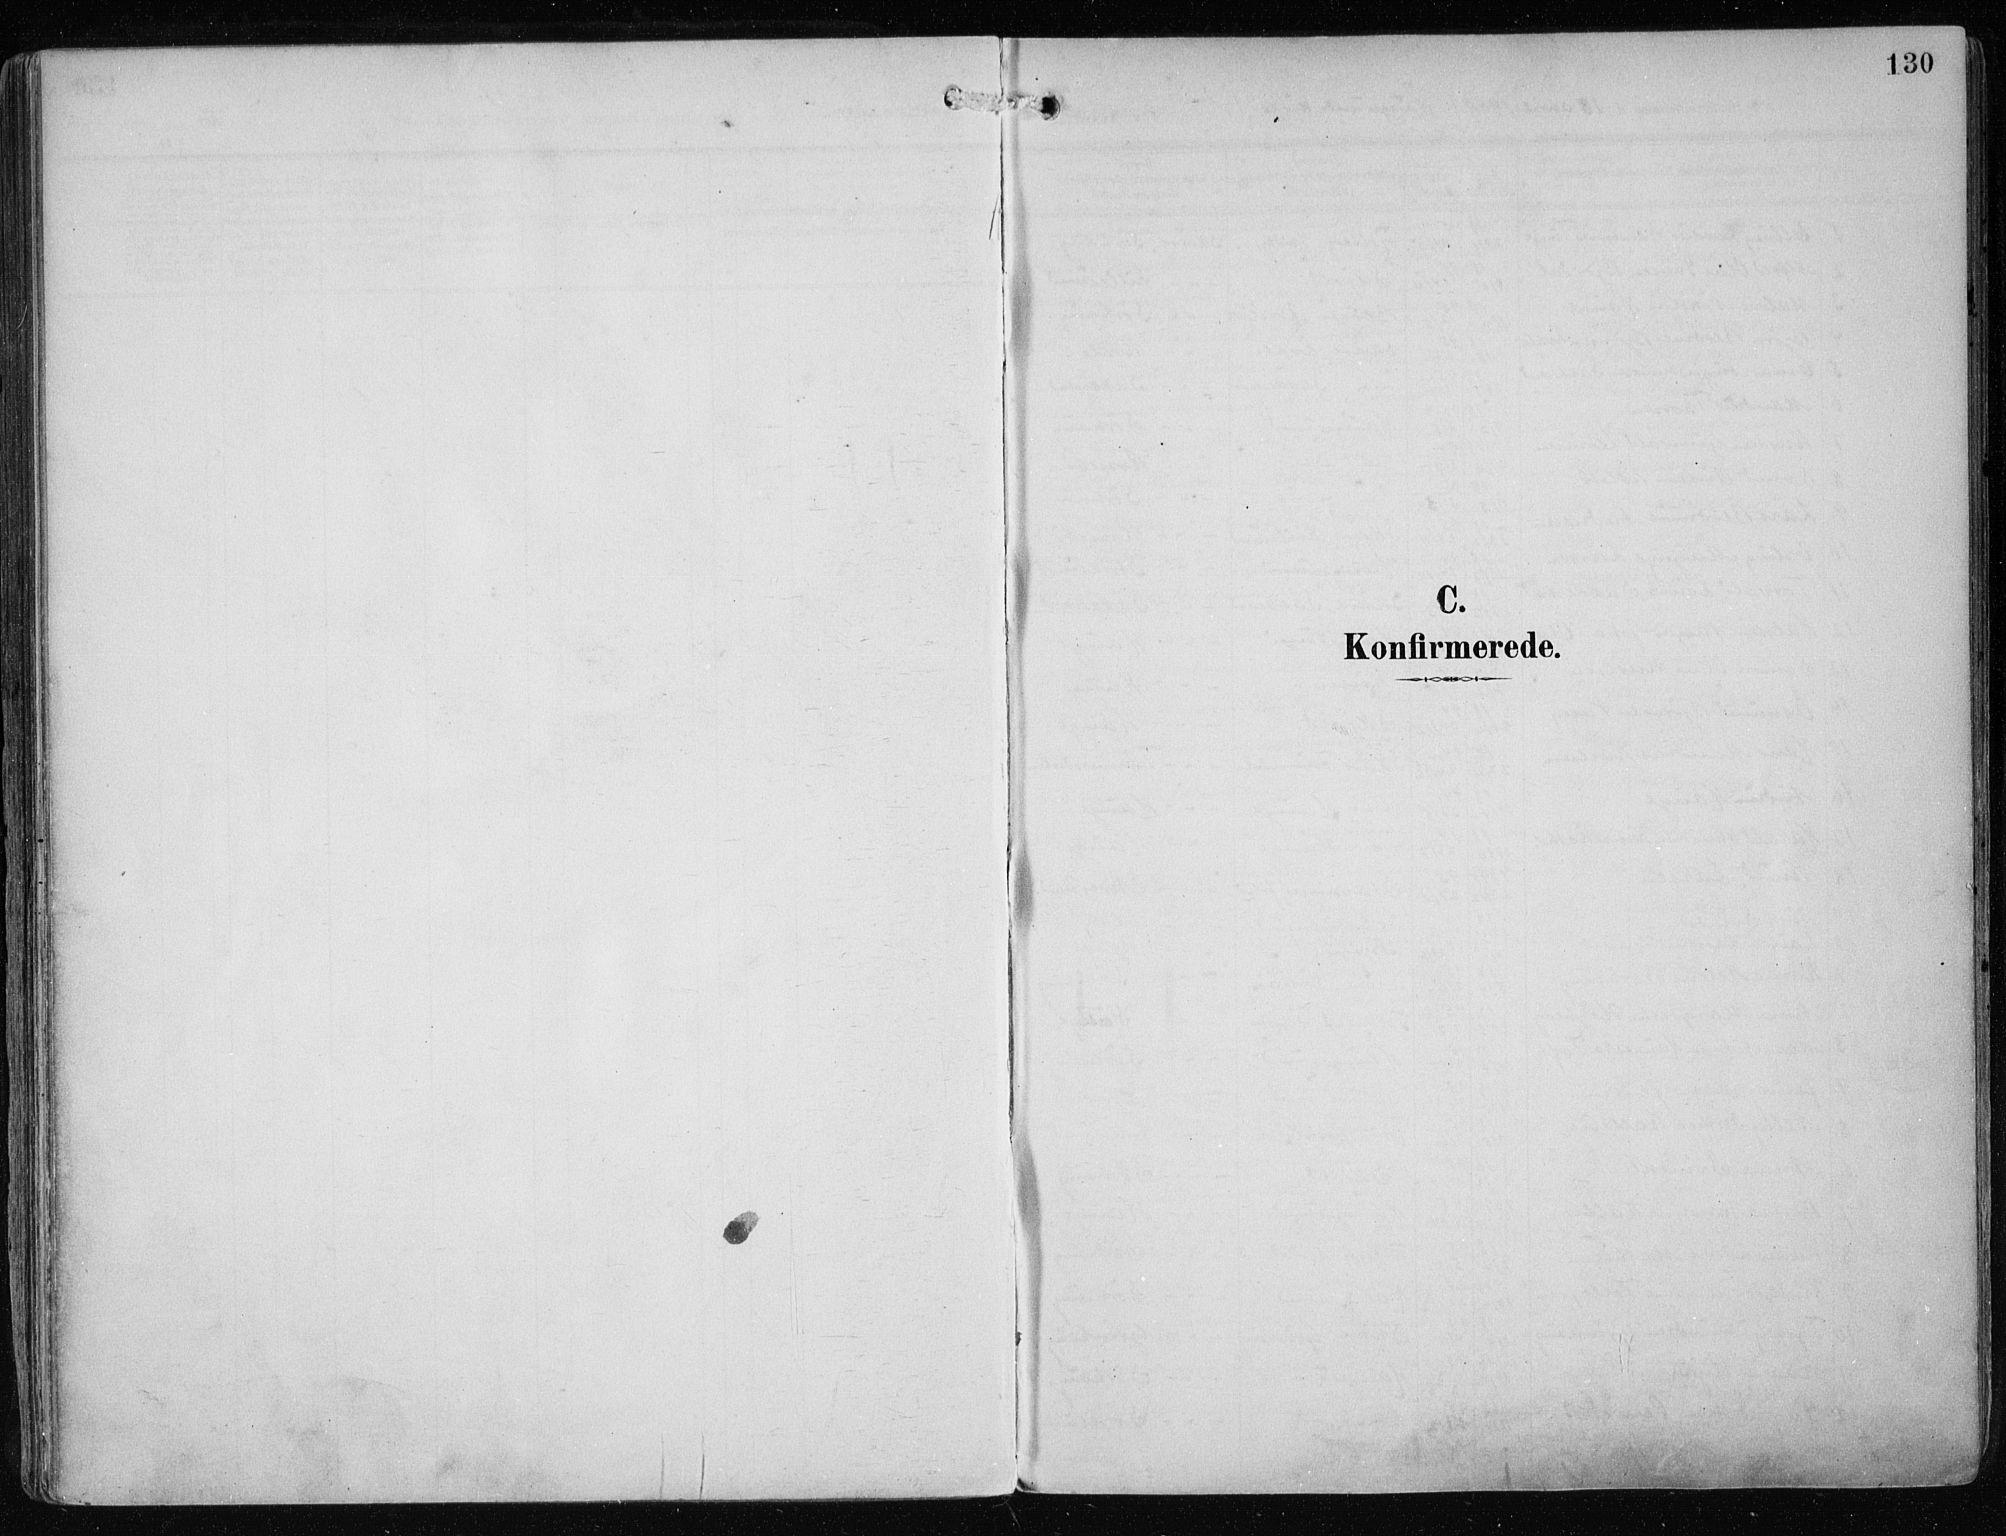 SAST, Haugesund sokneprestkontor, H/Ha/Haa/L0010: Ministerialbok nr. A 10, 1909-1935, s. 130